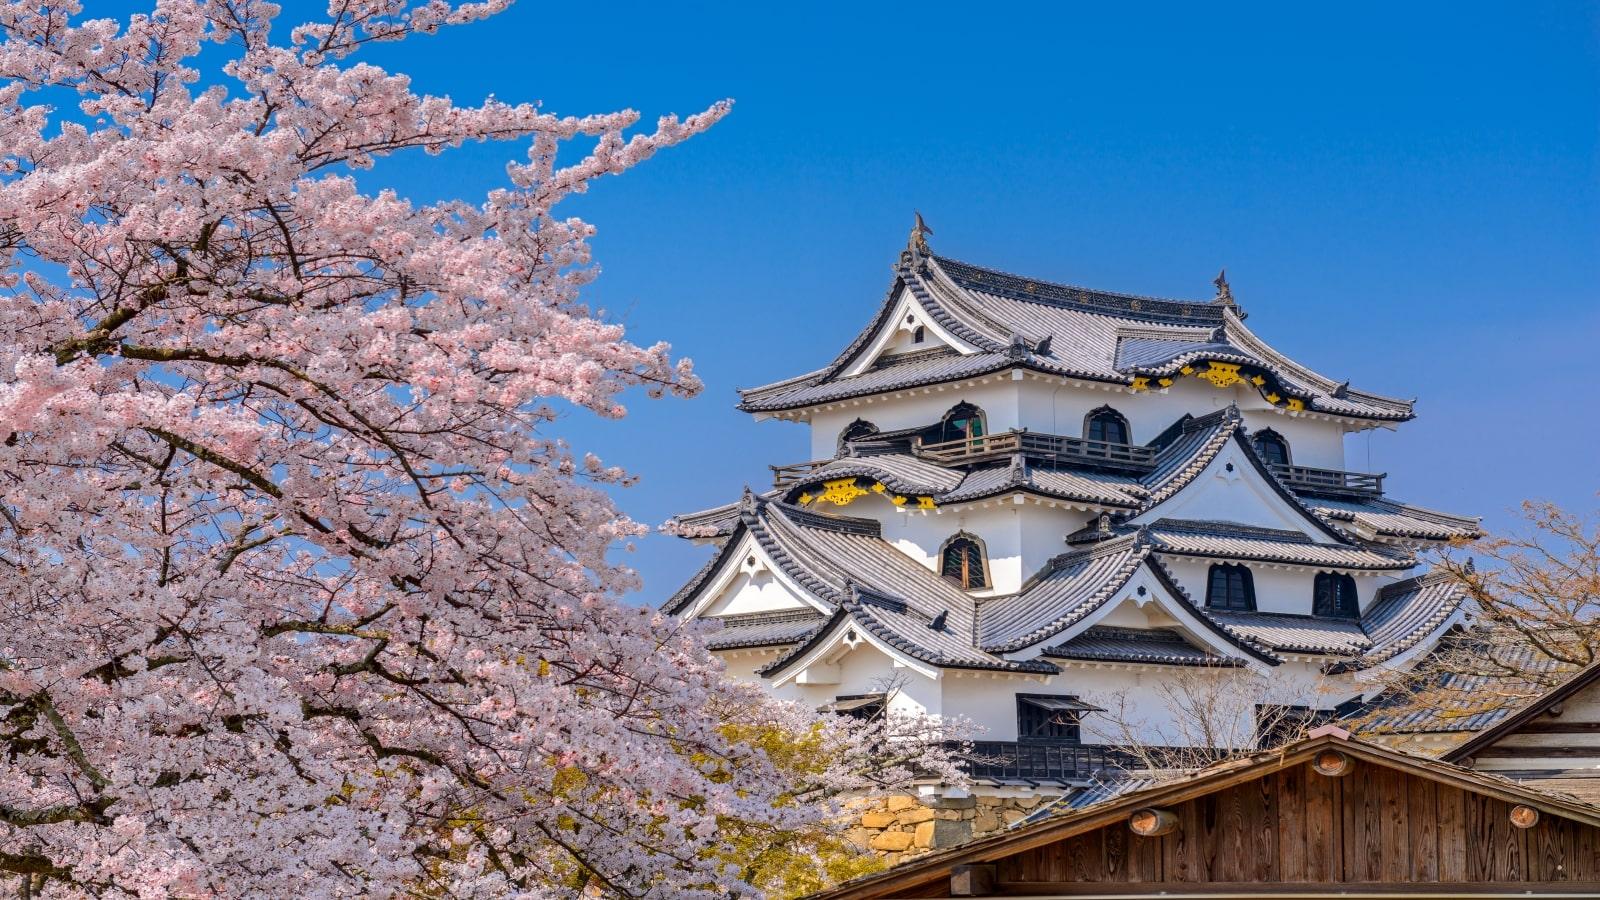 Hikone Castle during spring season